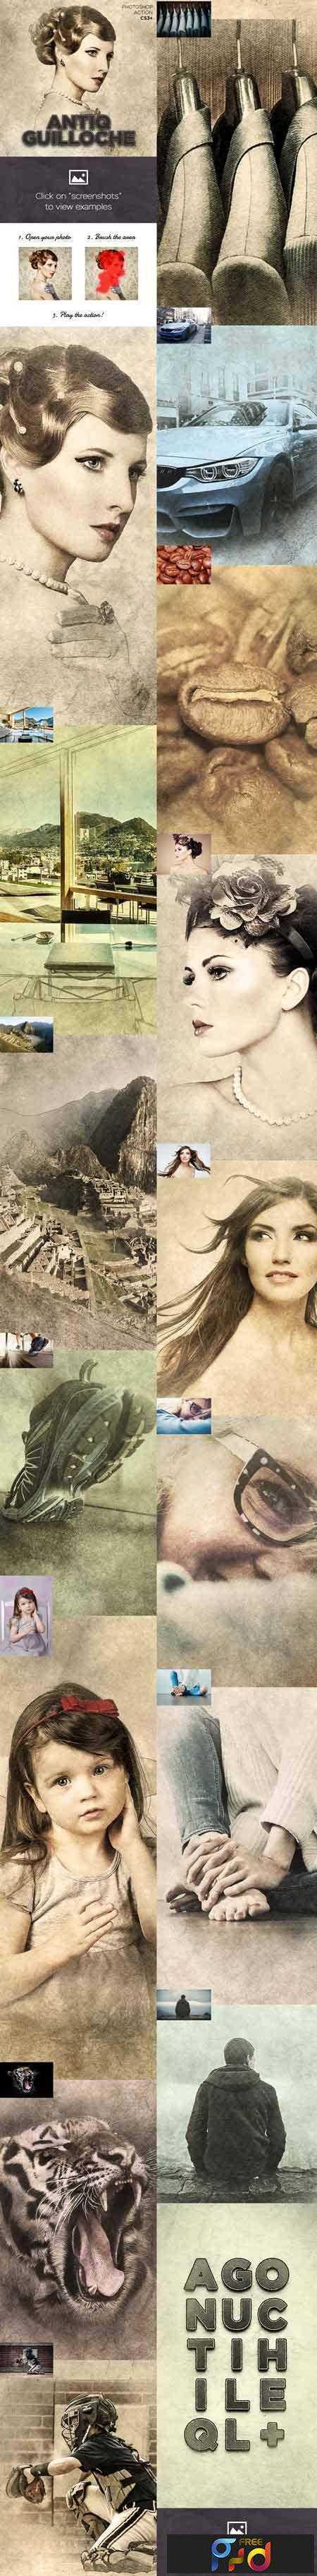 1804206 Antiq Guilloche Photoshop Action CS3+ 15956802